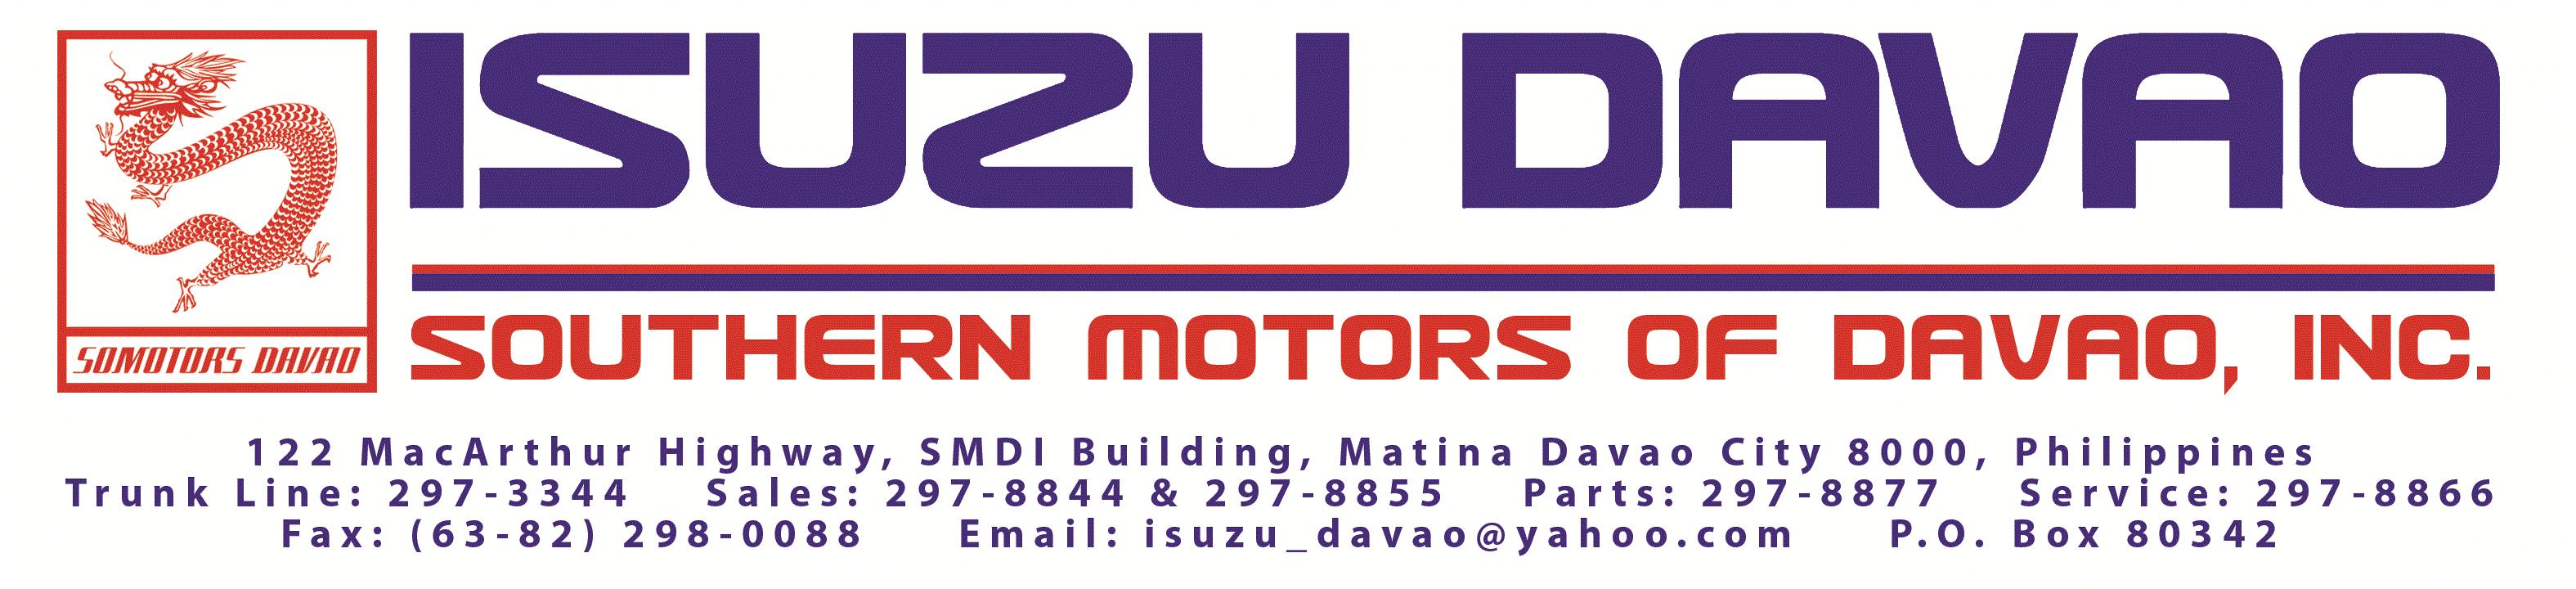 Southern Motors of Davao Inc